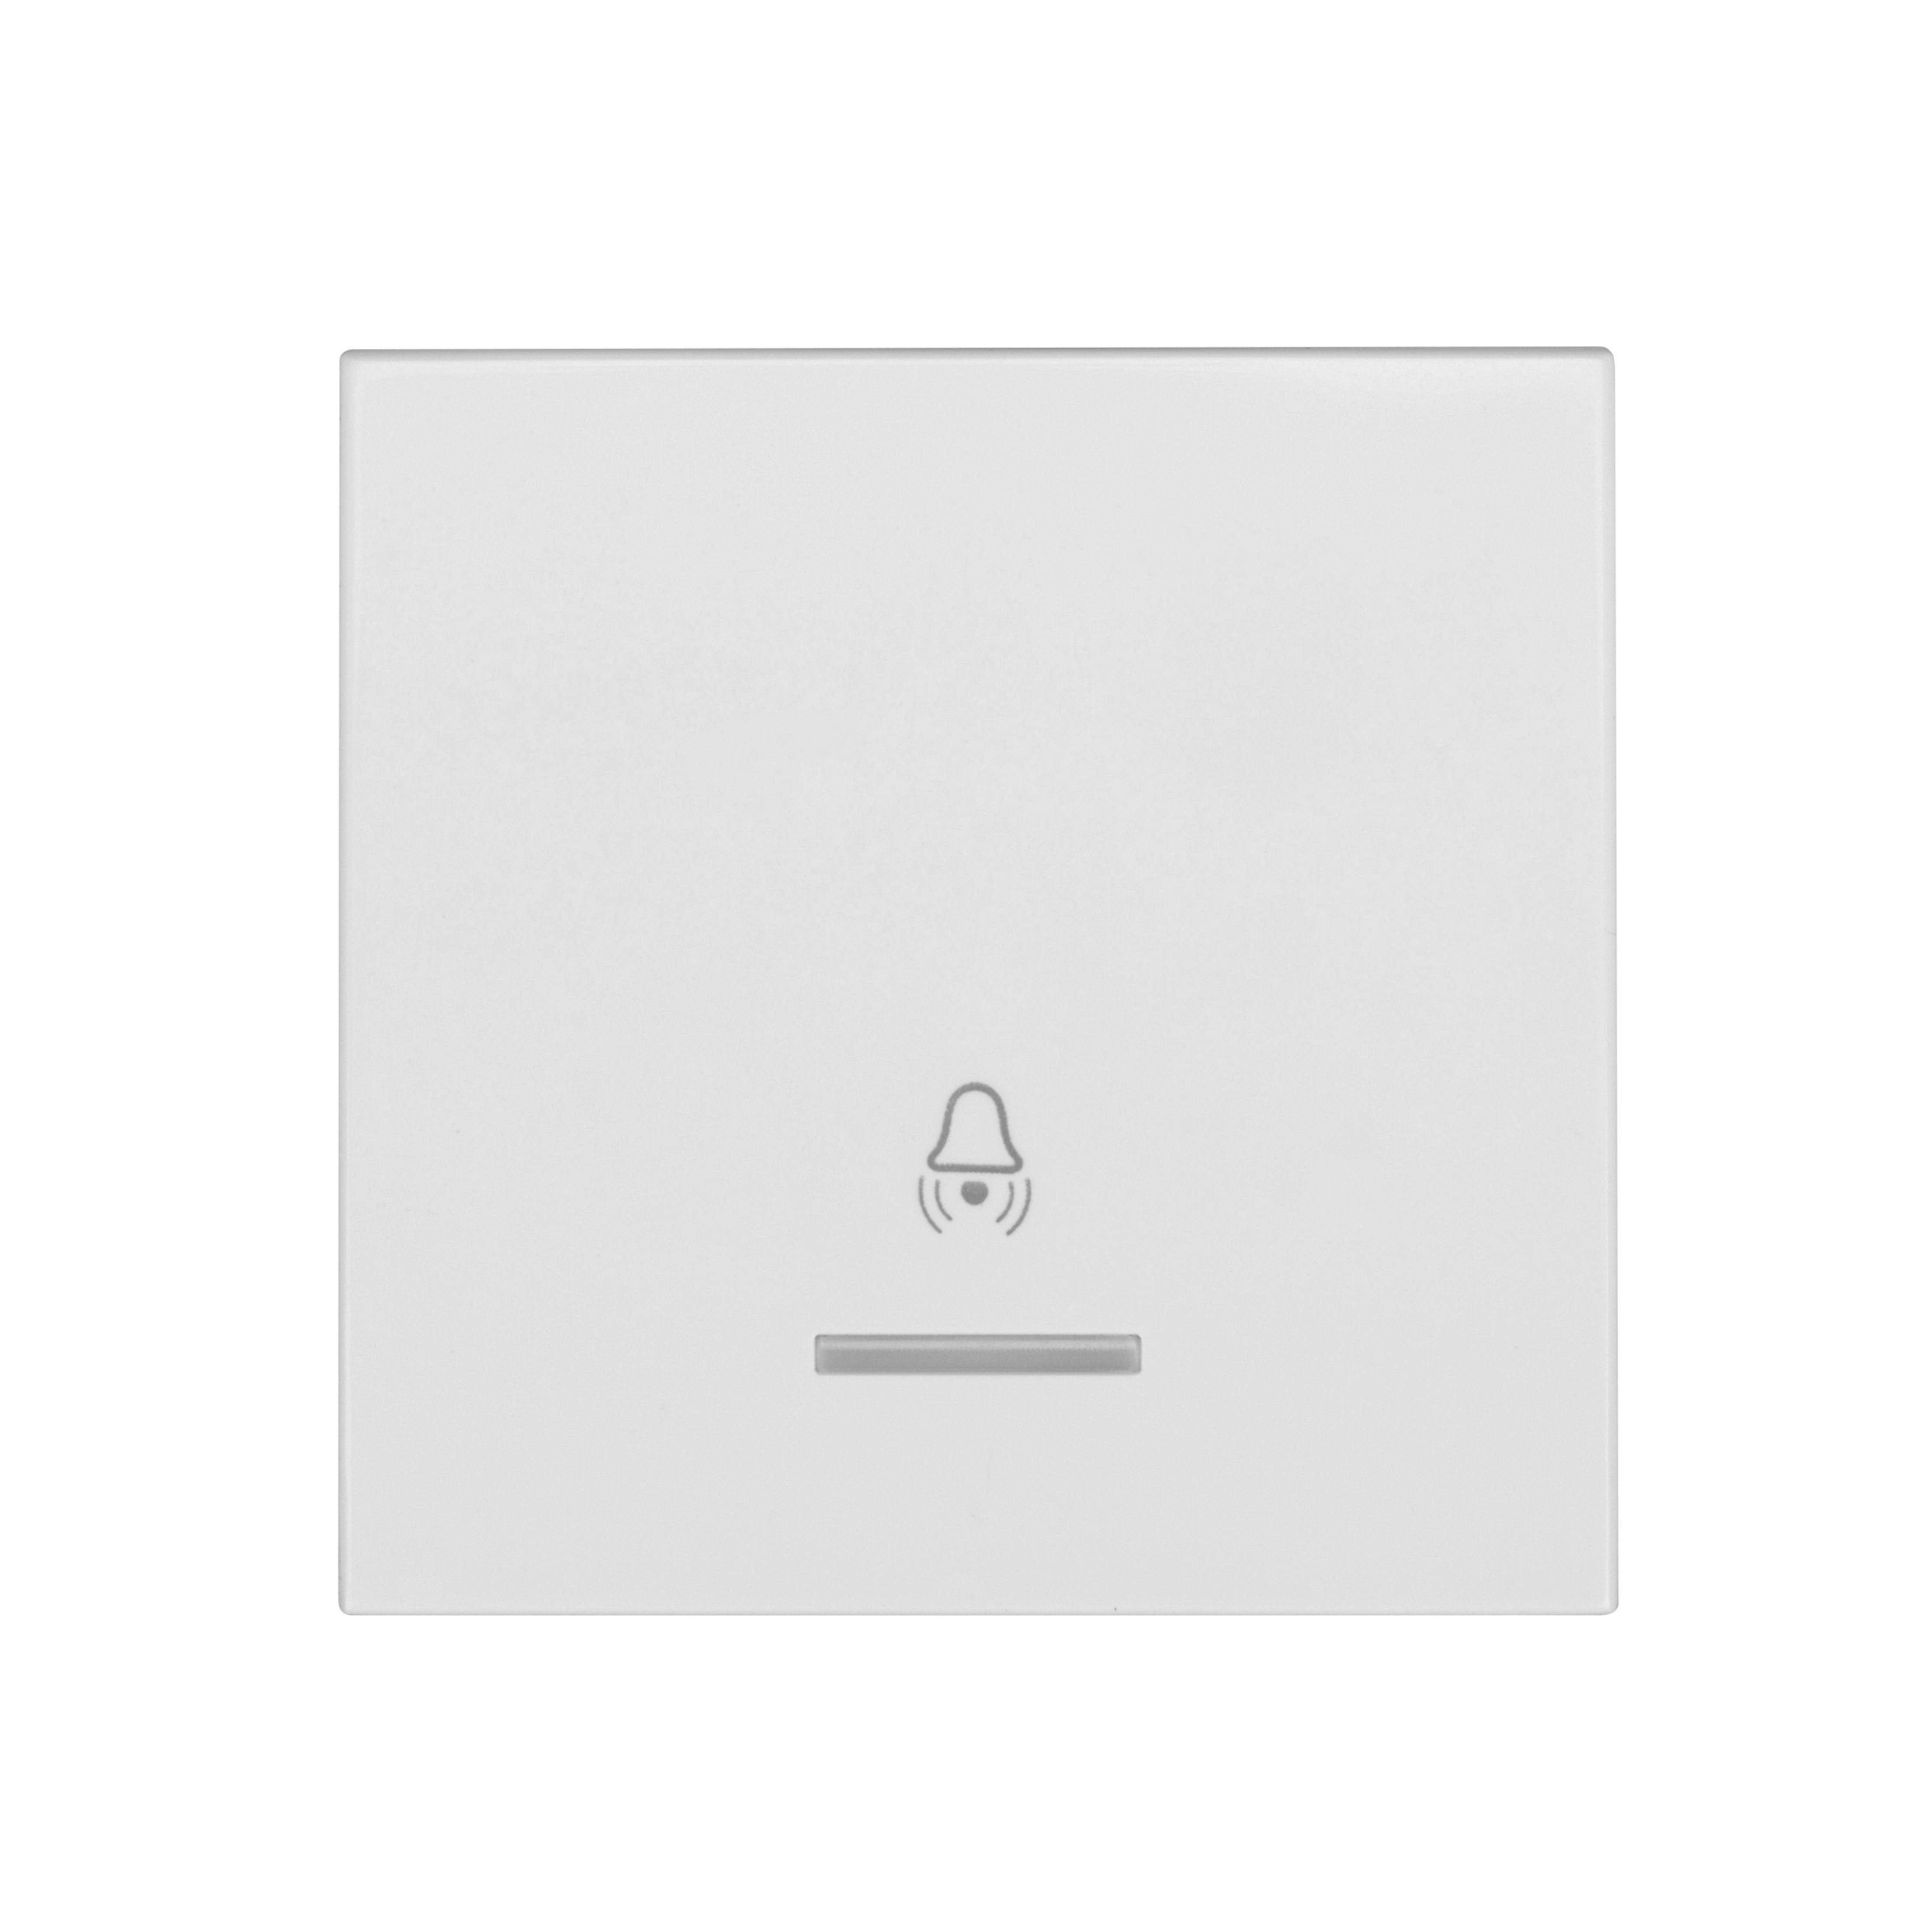 1 Stk Wippe mit transparenter Linse, Symbol Glocke, weiß EV102010--